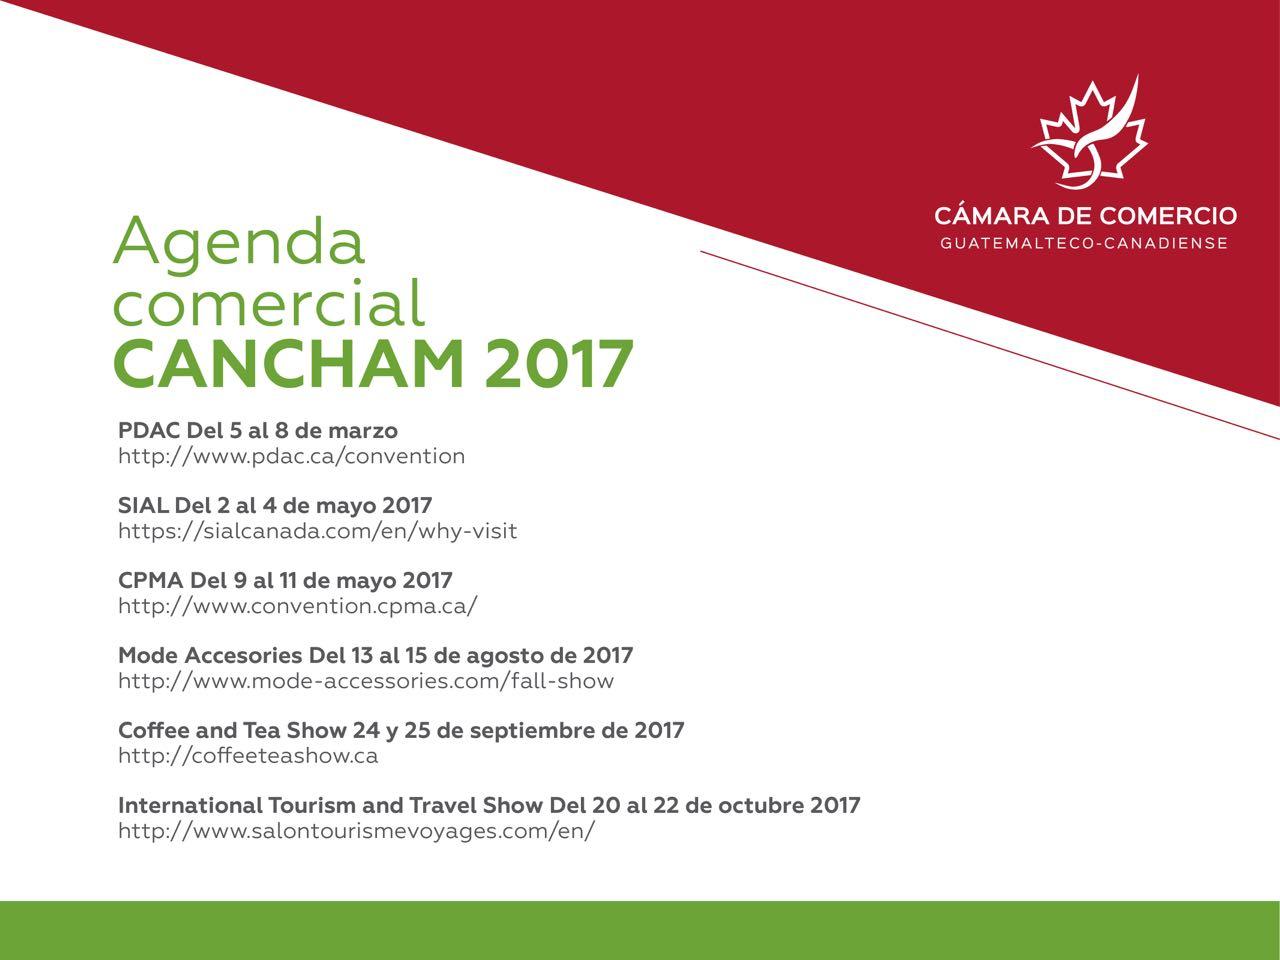 Agenda-Comercial-2017